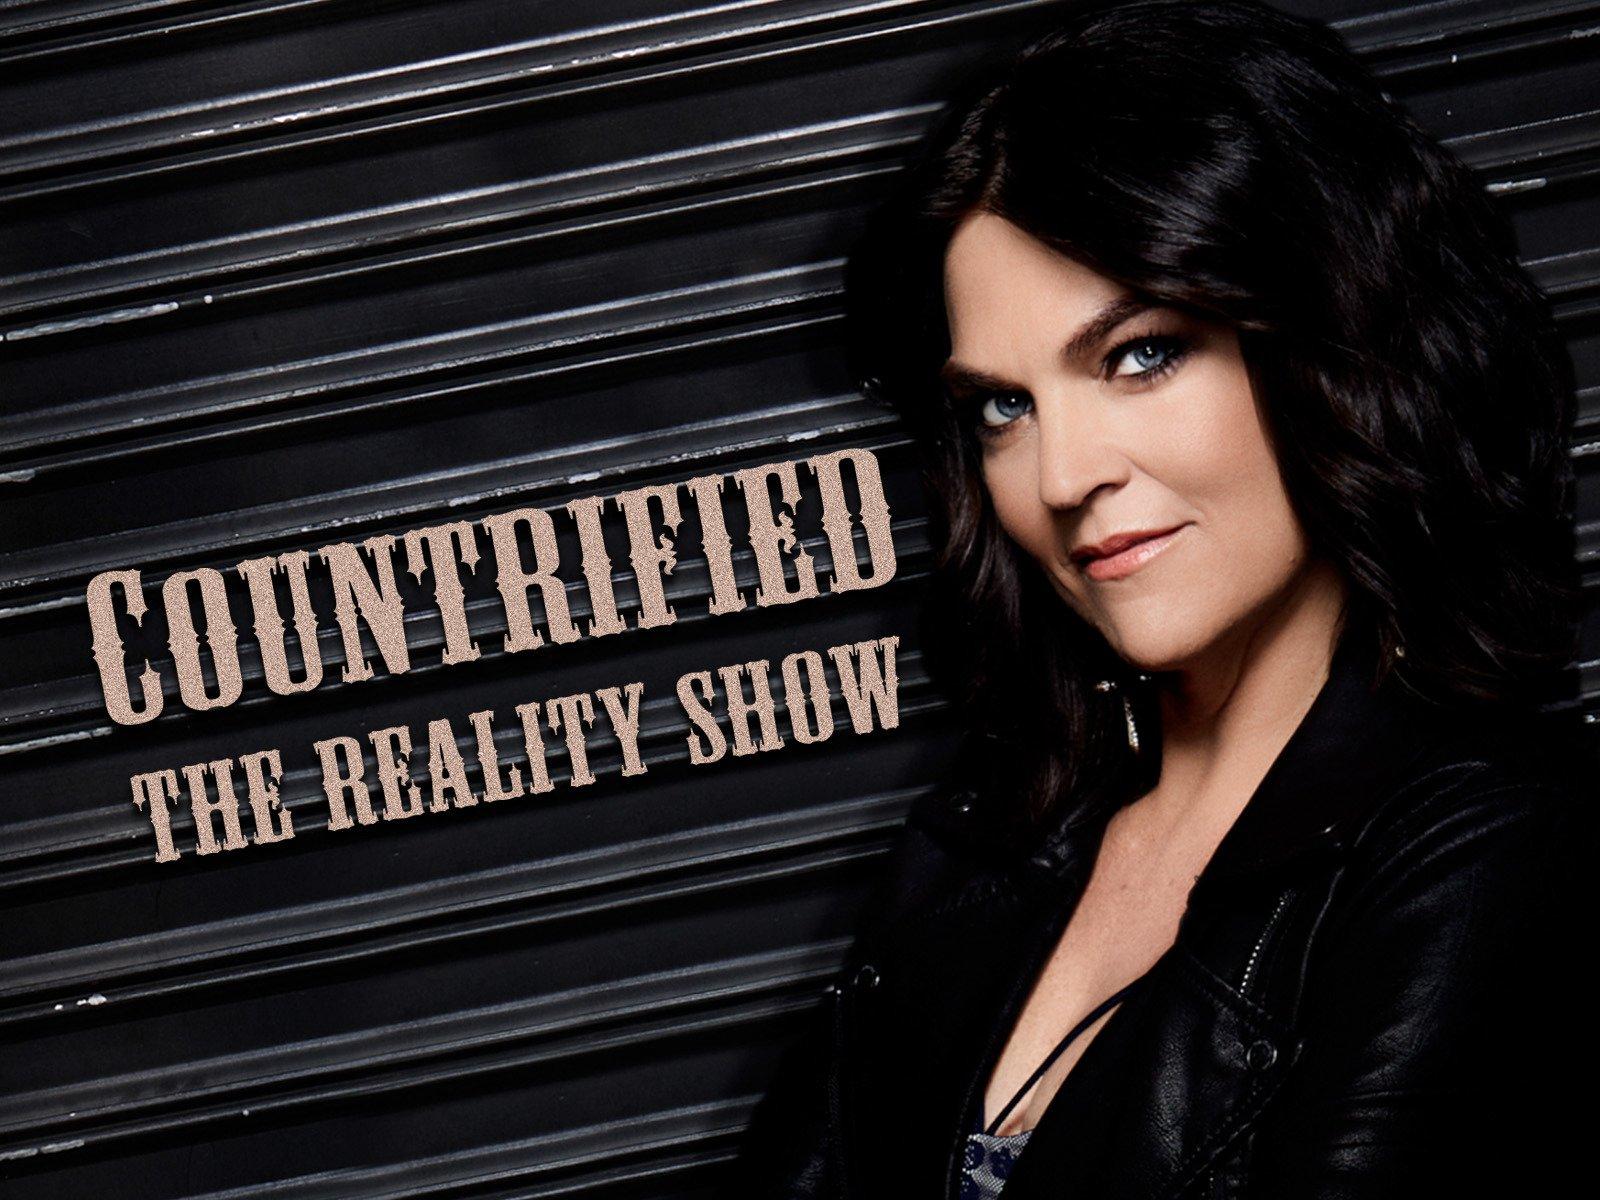 Countrified The Reality Show - Season 1